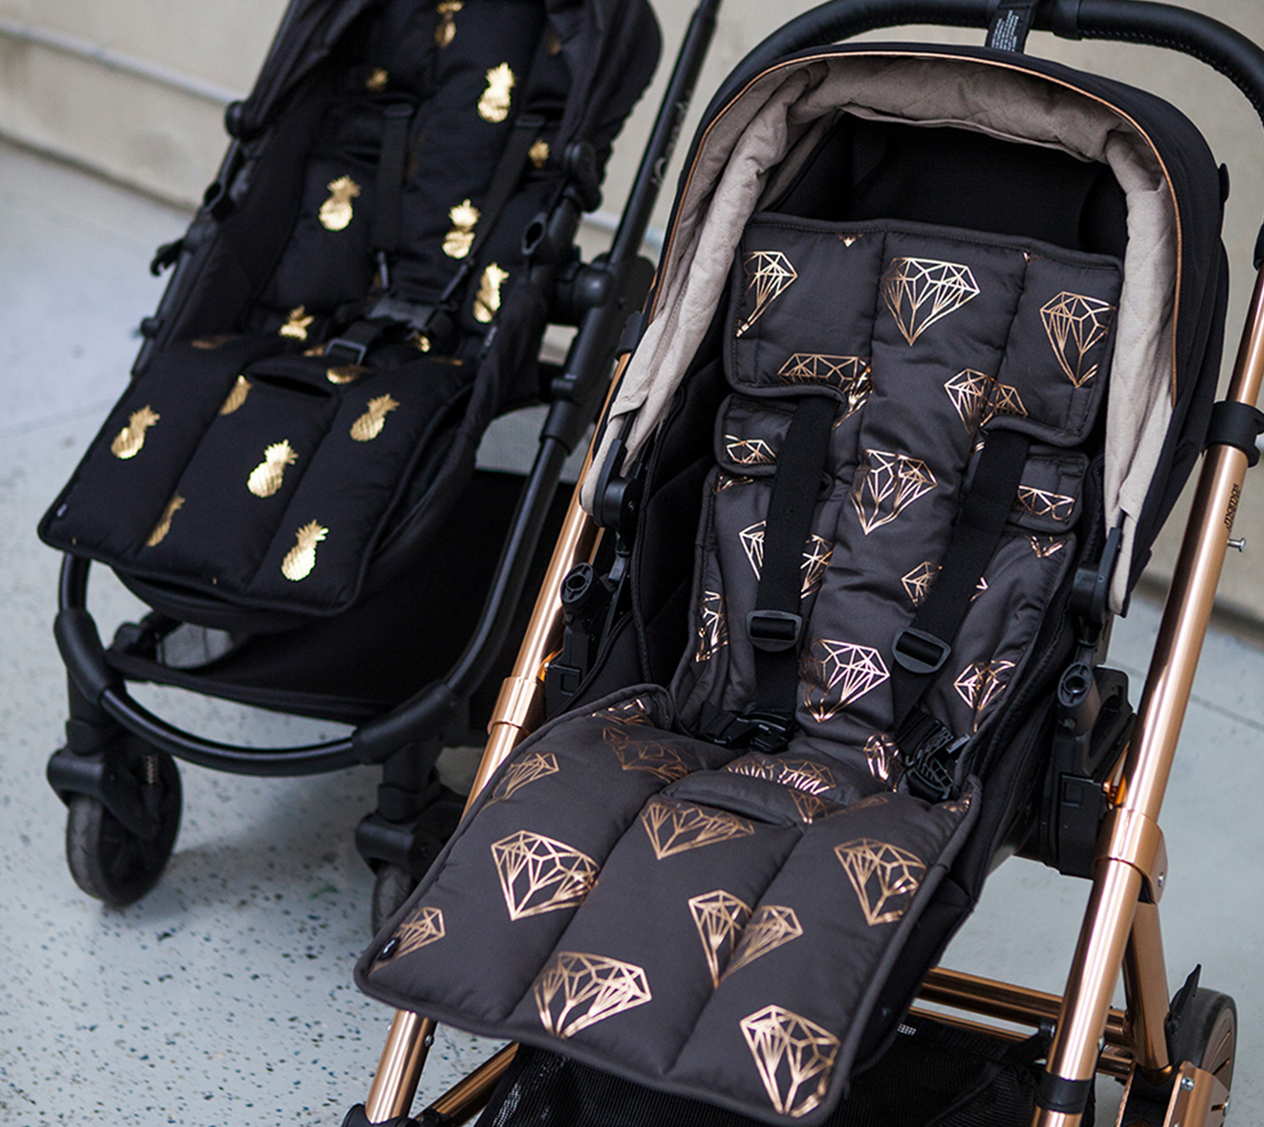 Stroller pad 嬰幼兒涼墊